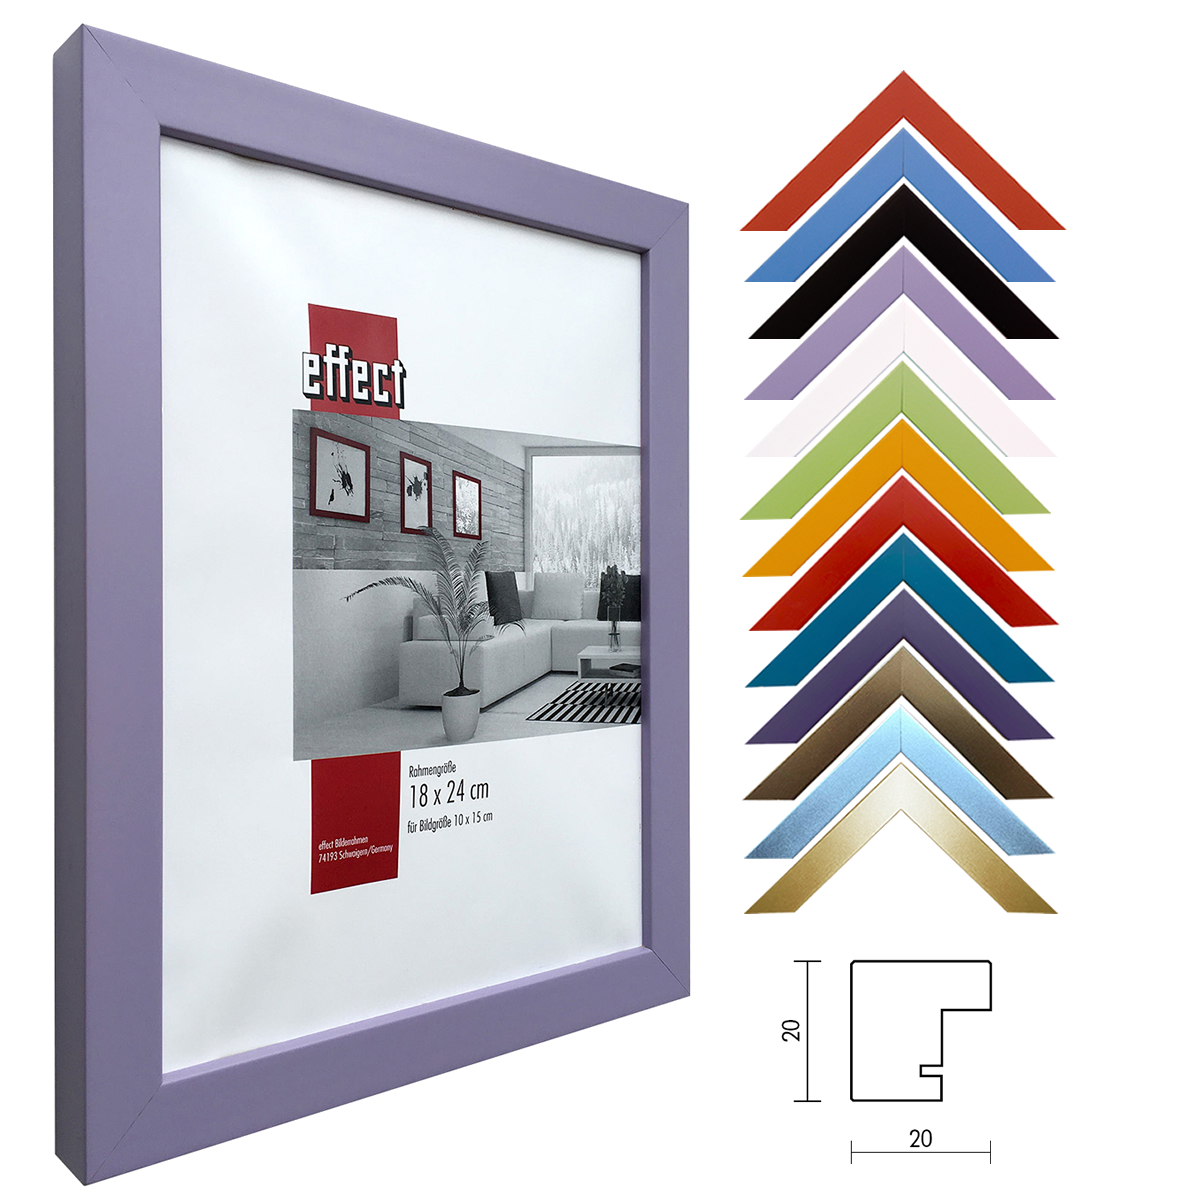 holz bilderrahmen top cube f r kreativ passepartout. Black Bedroom Furniture Sets. Home Design Ideas